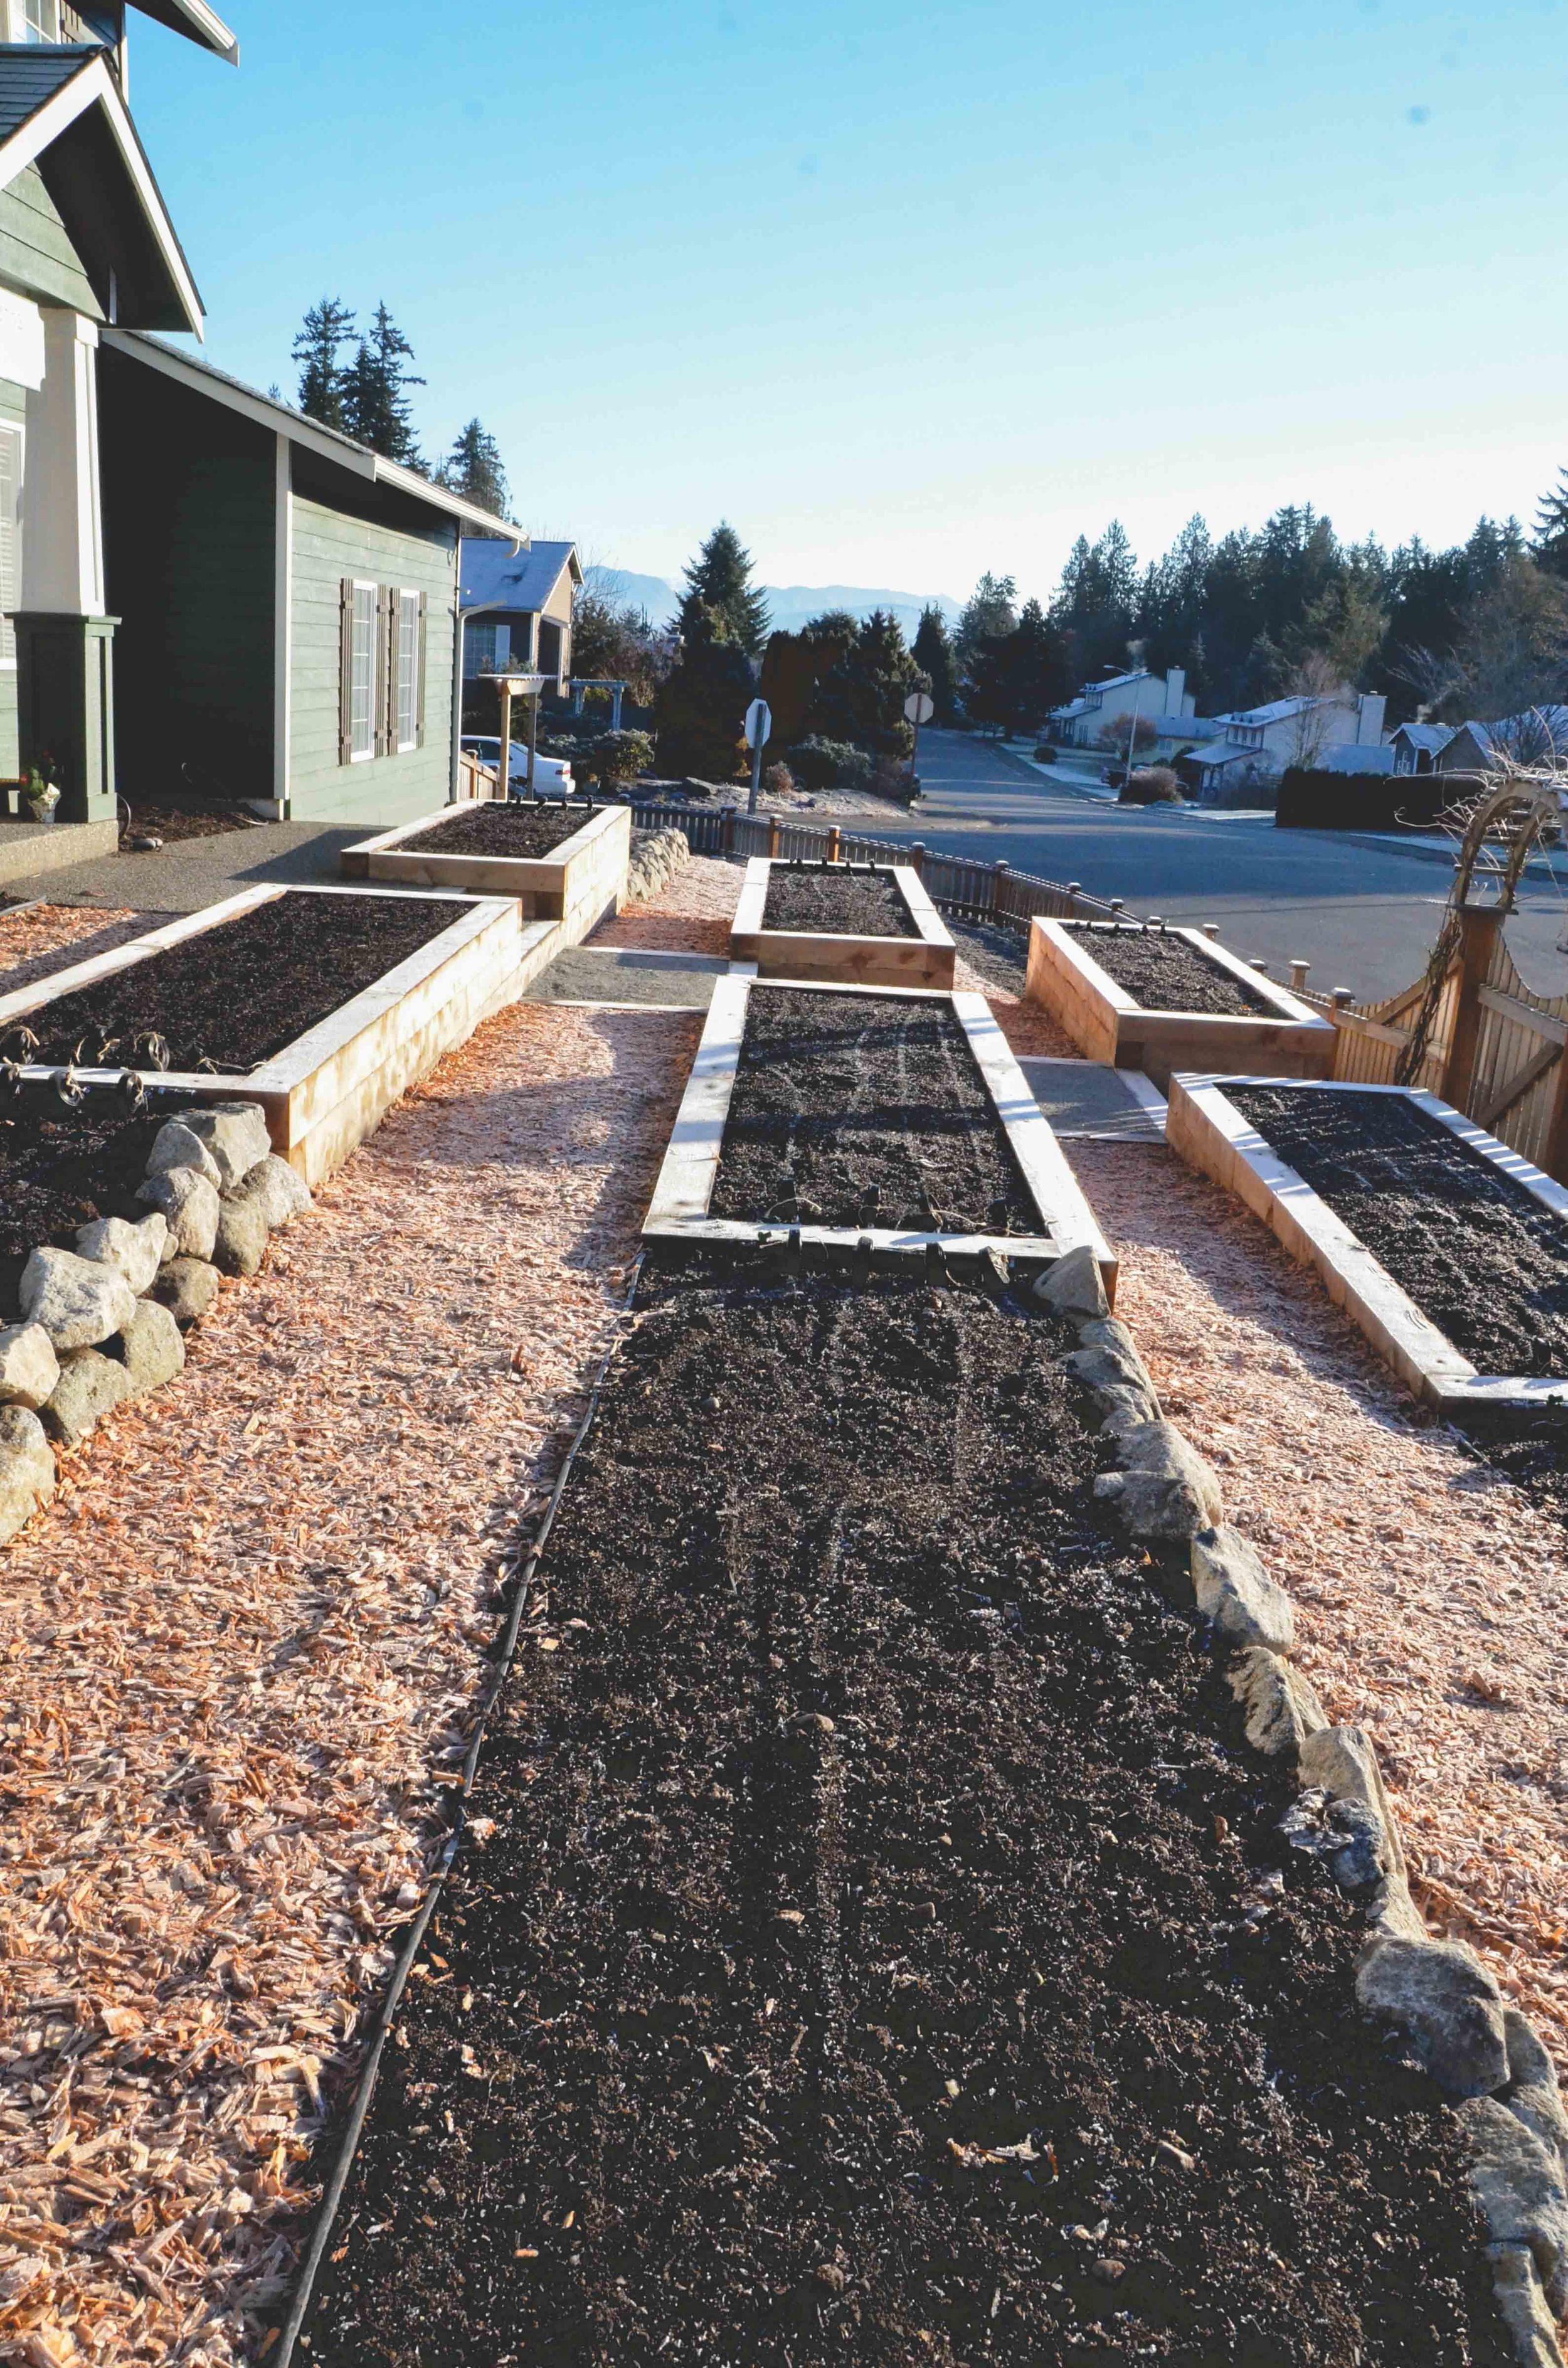 Suburban Front Yard Farm_Seattle Urban Farm Co. Design/Build